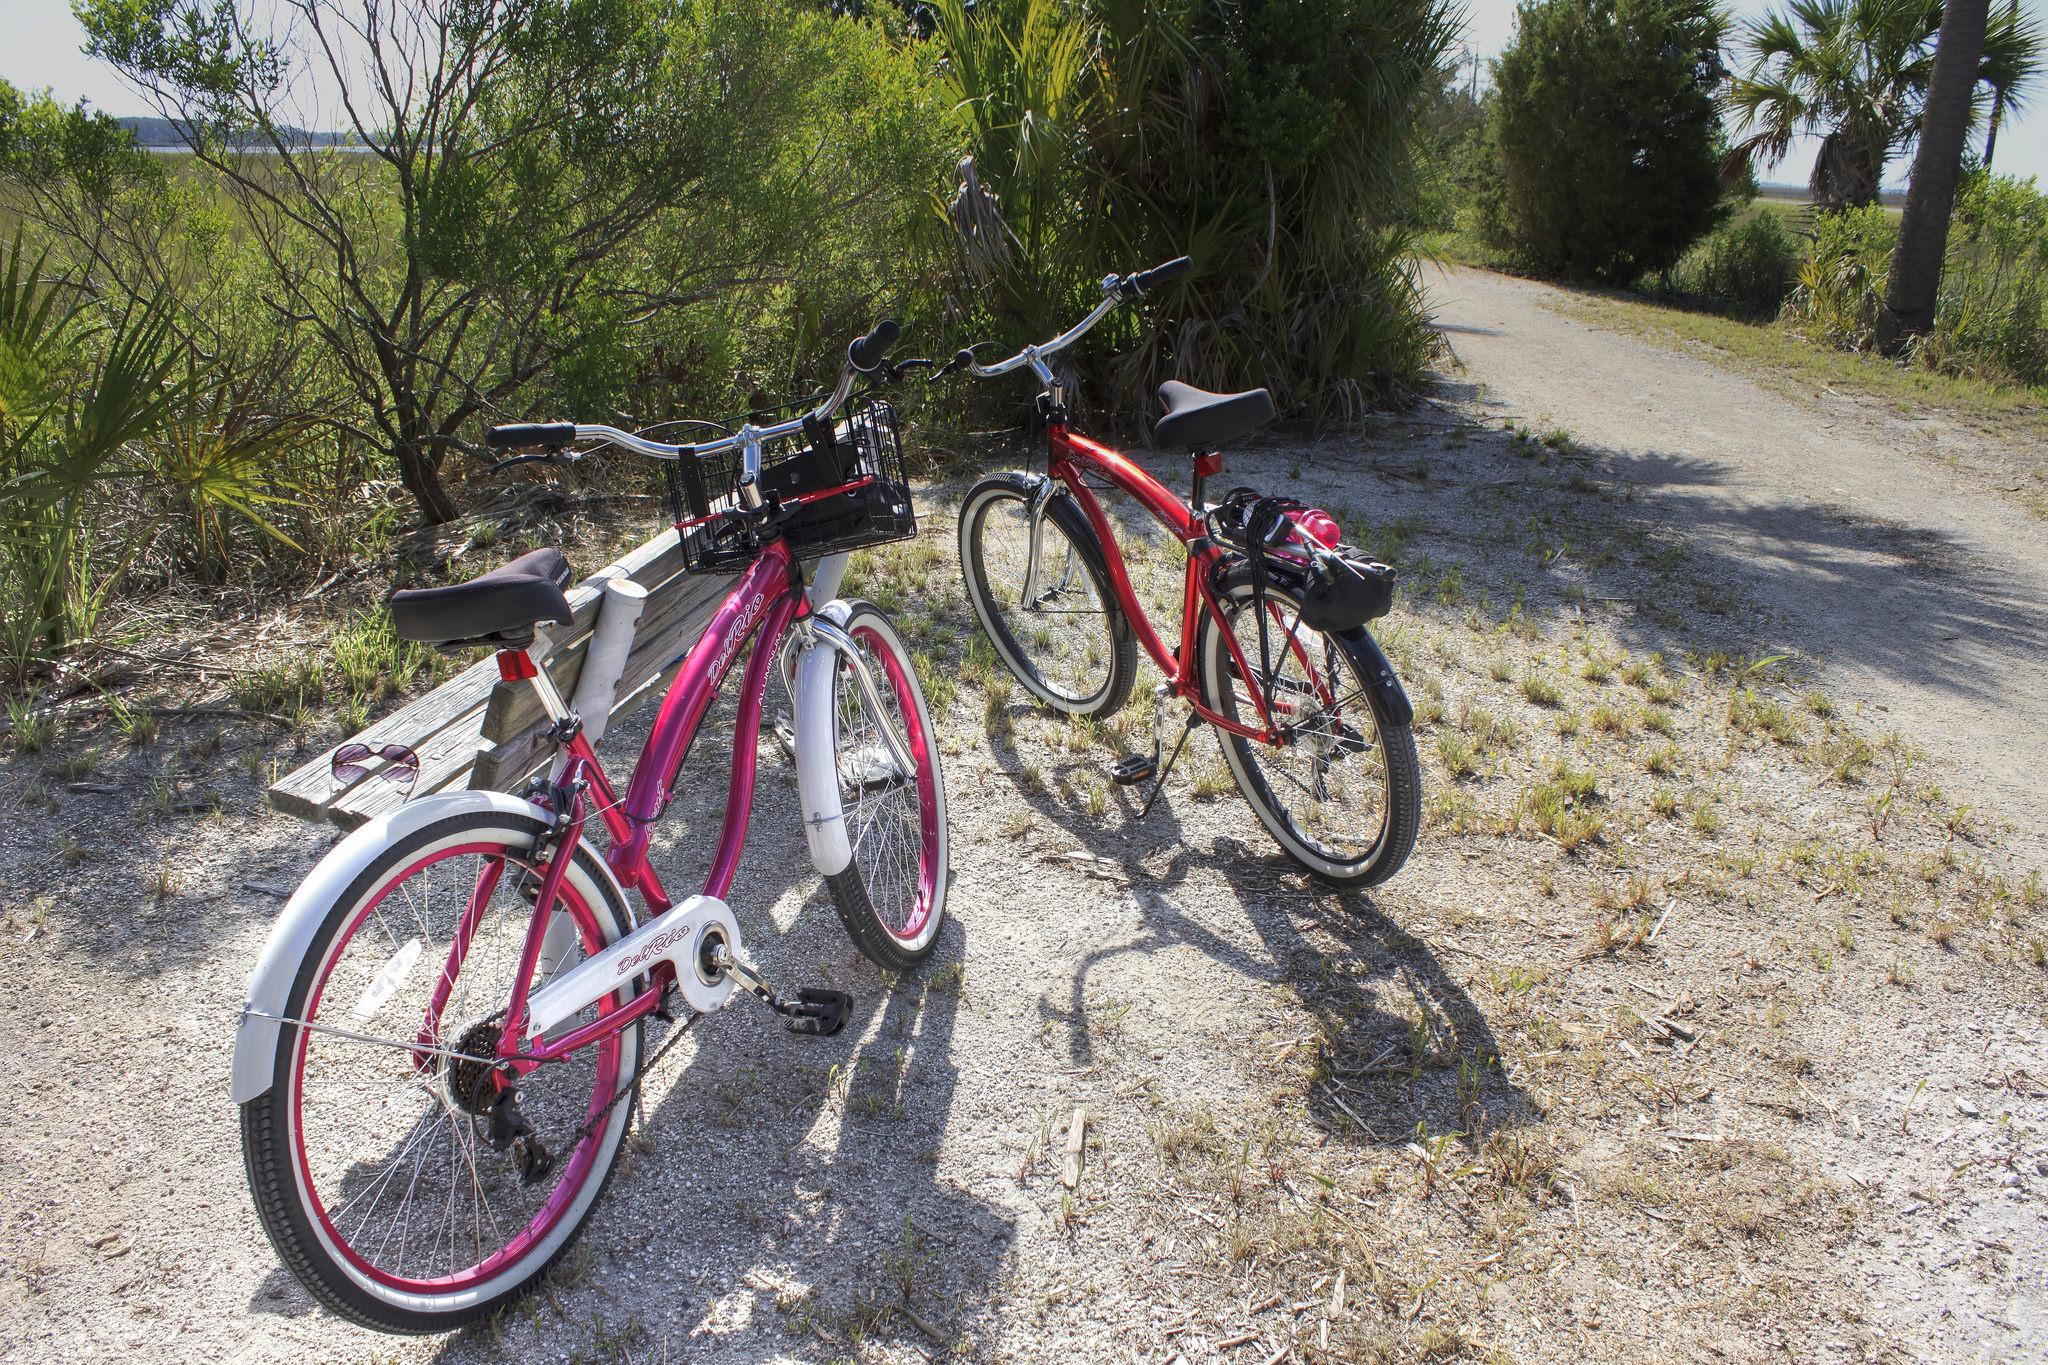 Renting bikes in Tybee